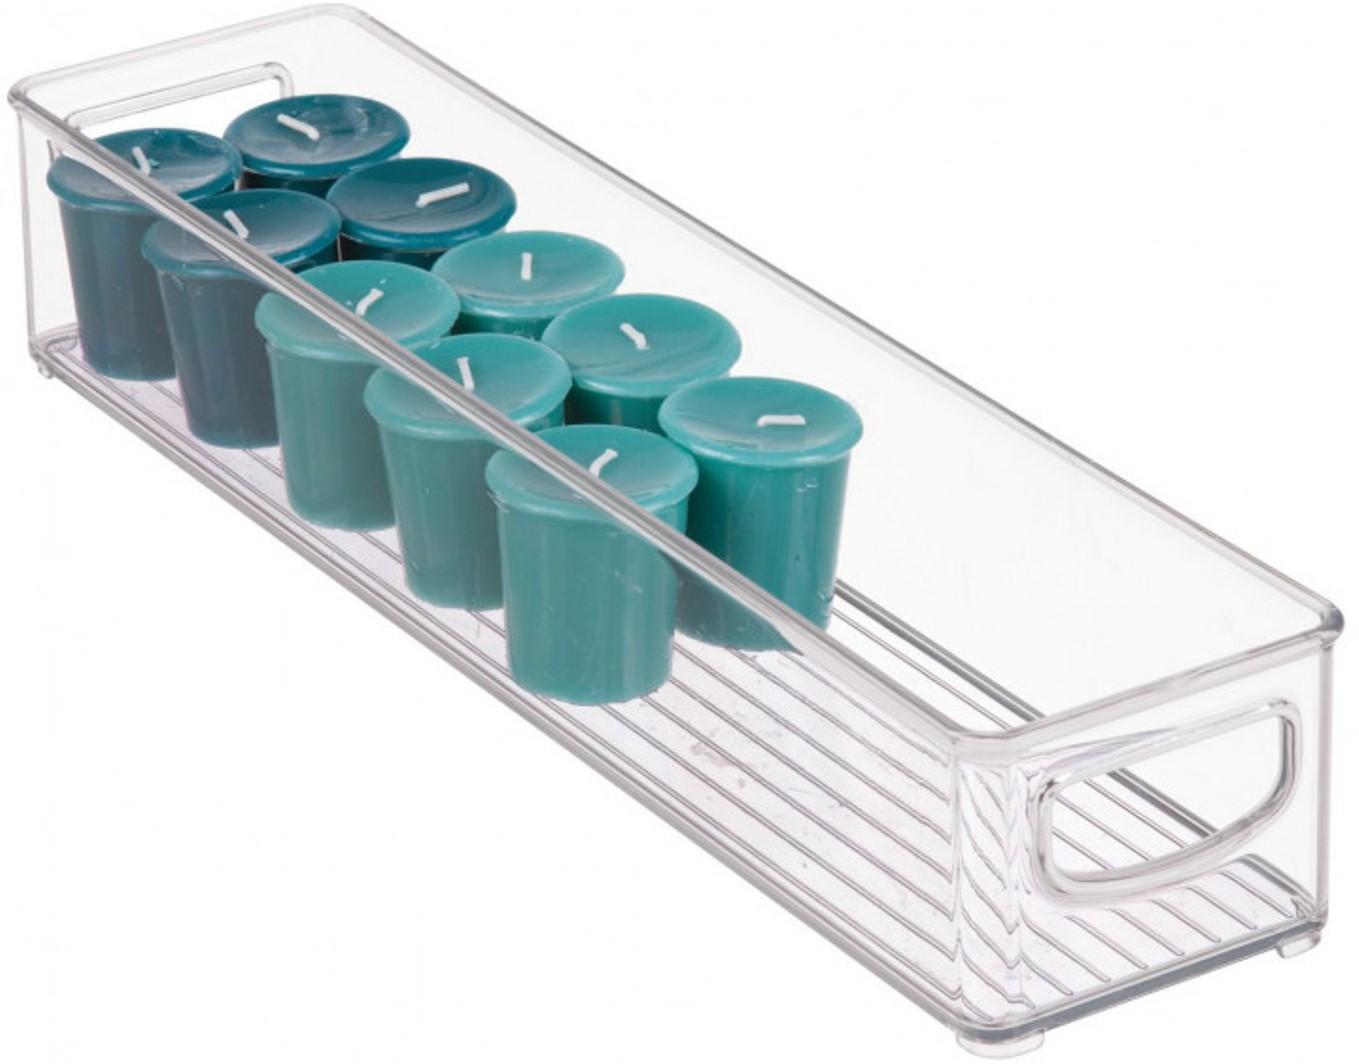 Онлайн каталог PROMENU: Органайзер кухонный iDesign CABINET/KITCHEN BINZ, 40,6х10,2х7,6 см, BPA-free пластик, прозрачный                                   64199EU